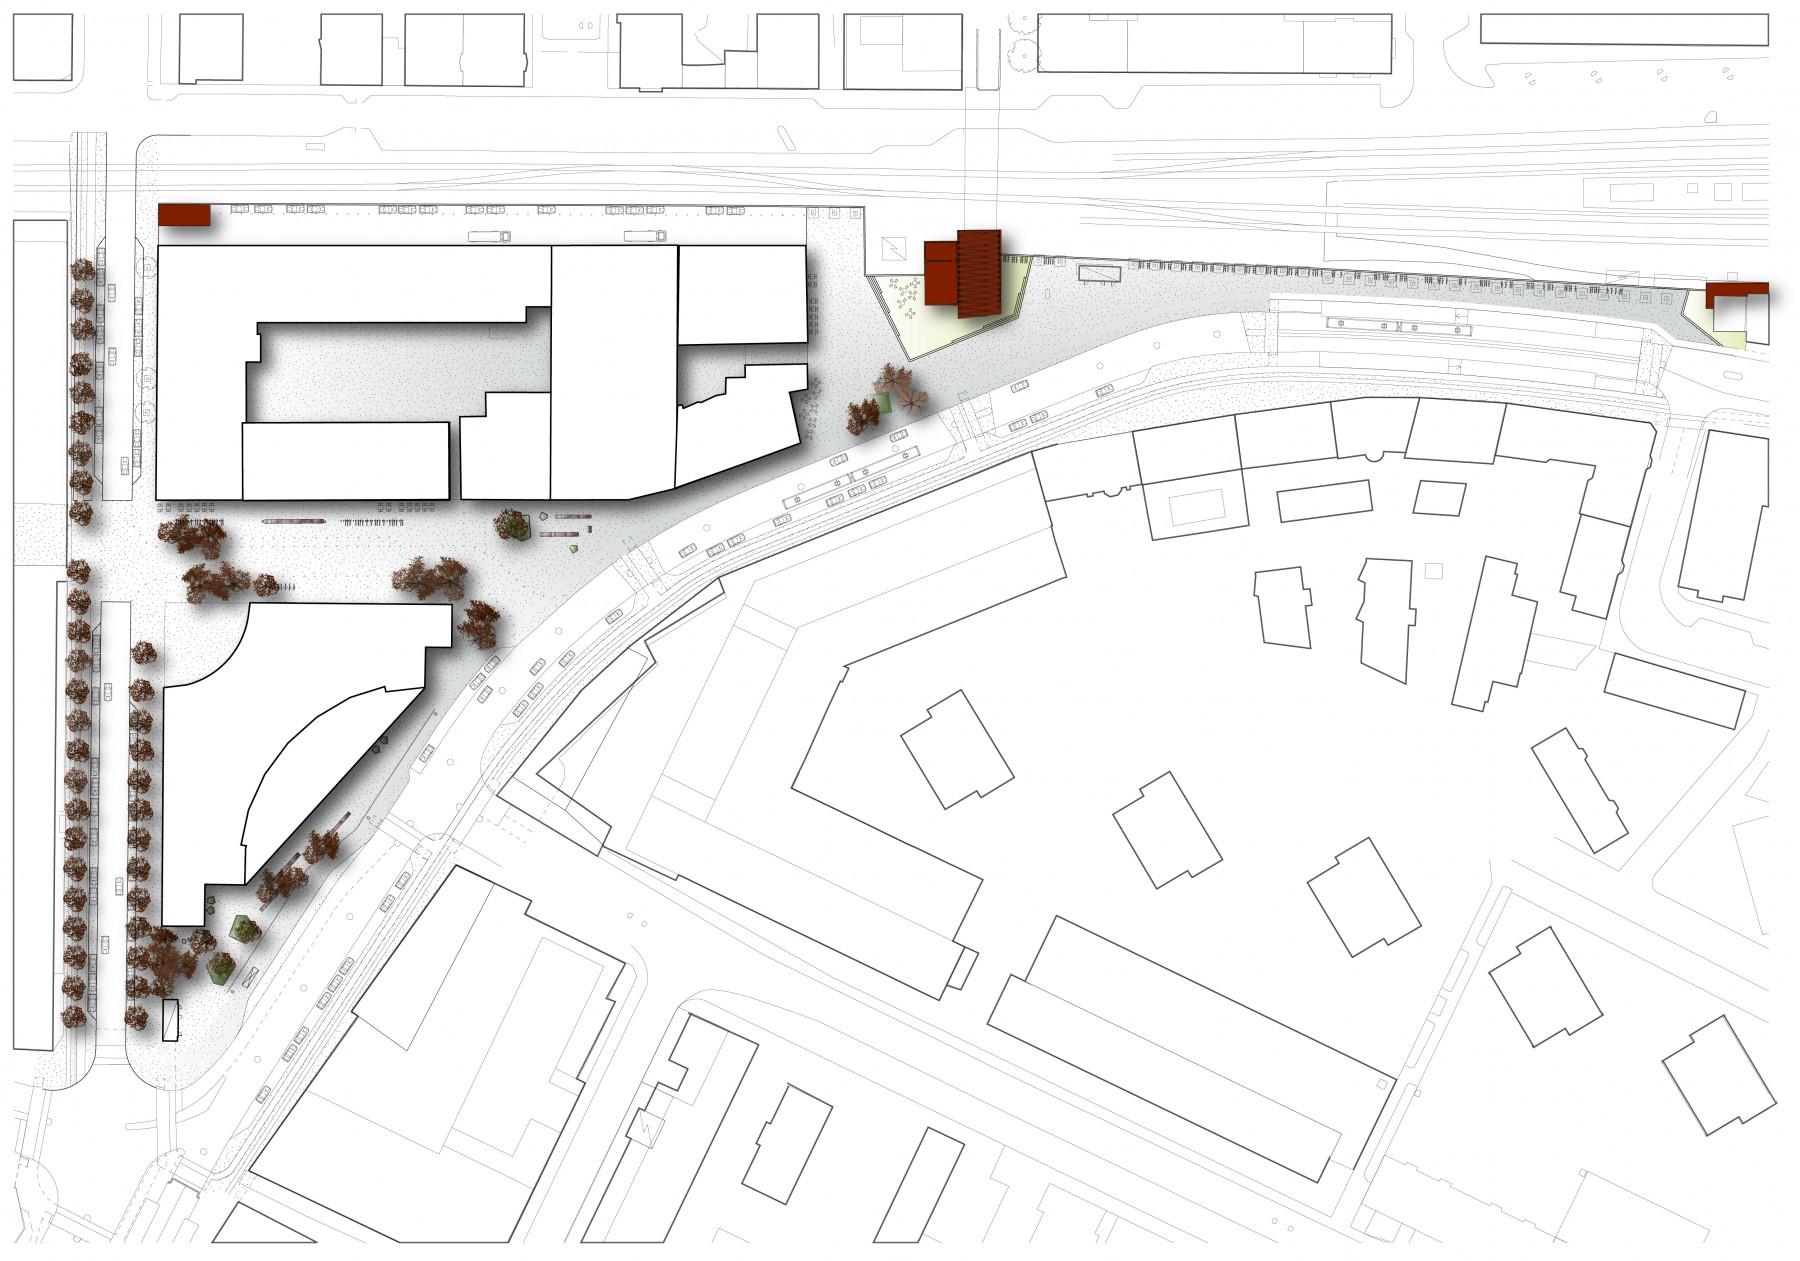 Sundbybergs_torg_LAND_2012_2014_plan